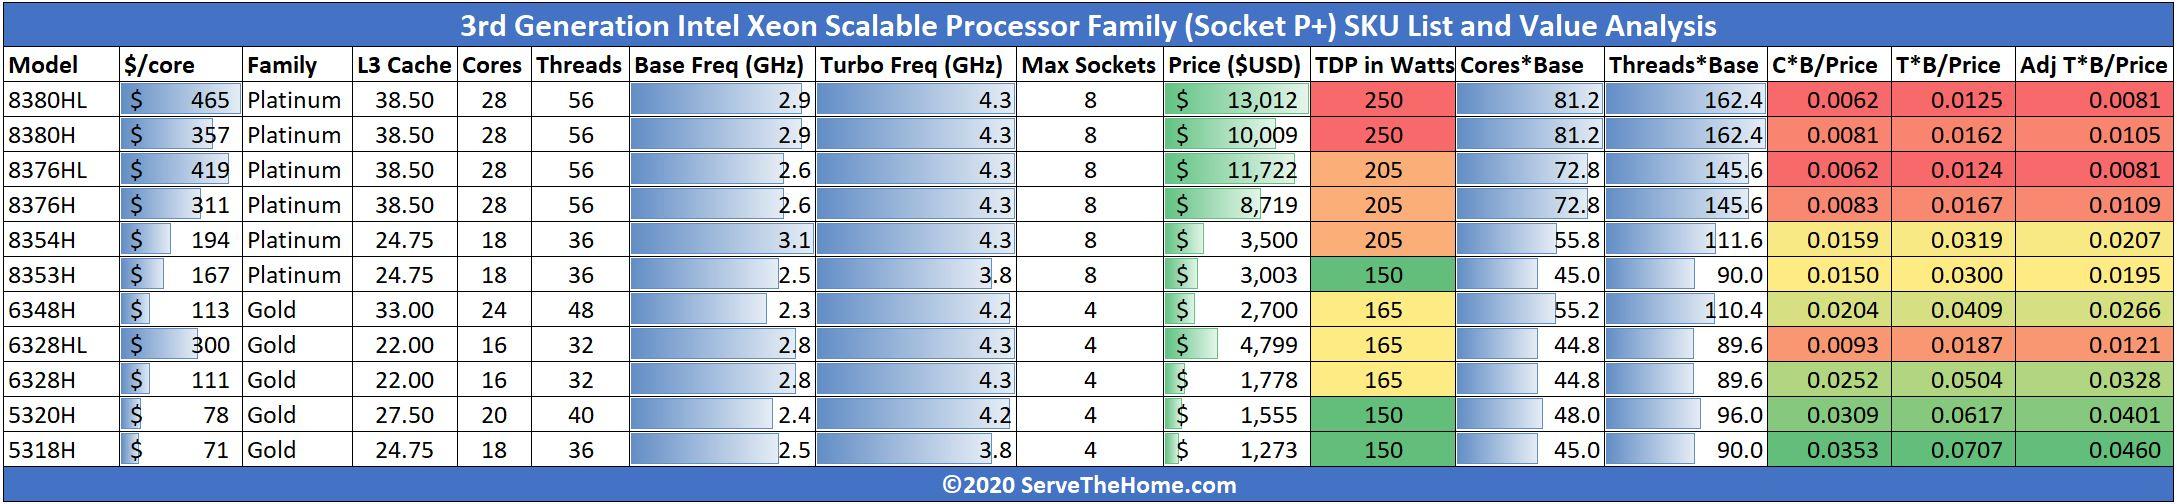 3rd Gen Intel Xeon Scalable SKU List